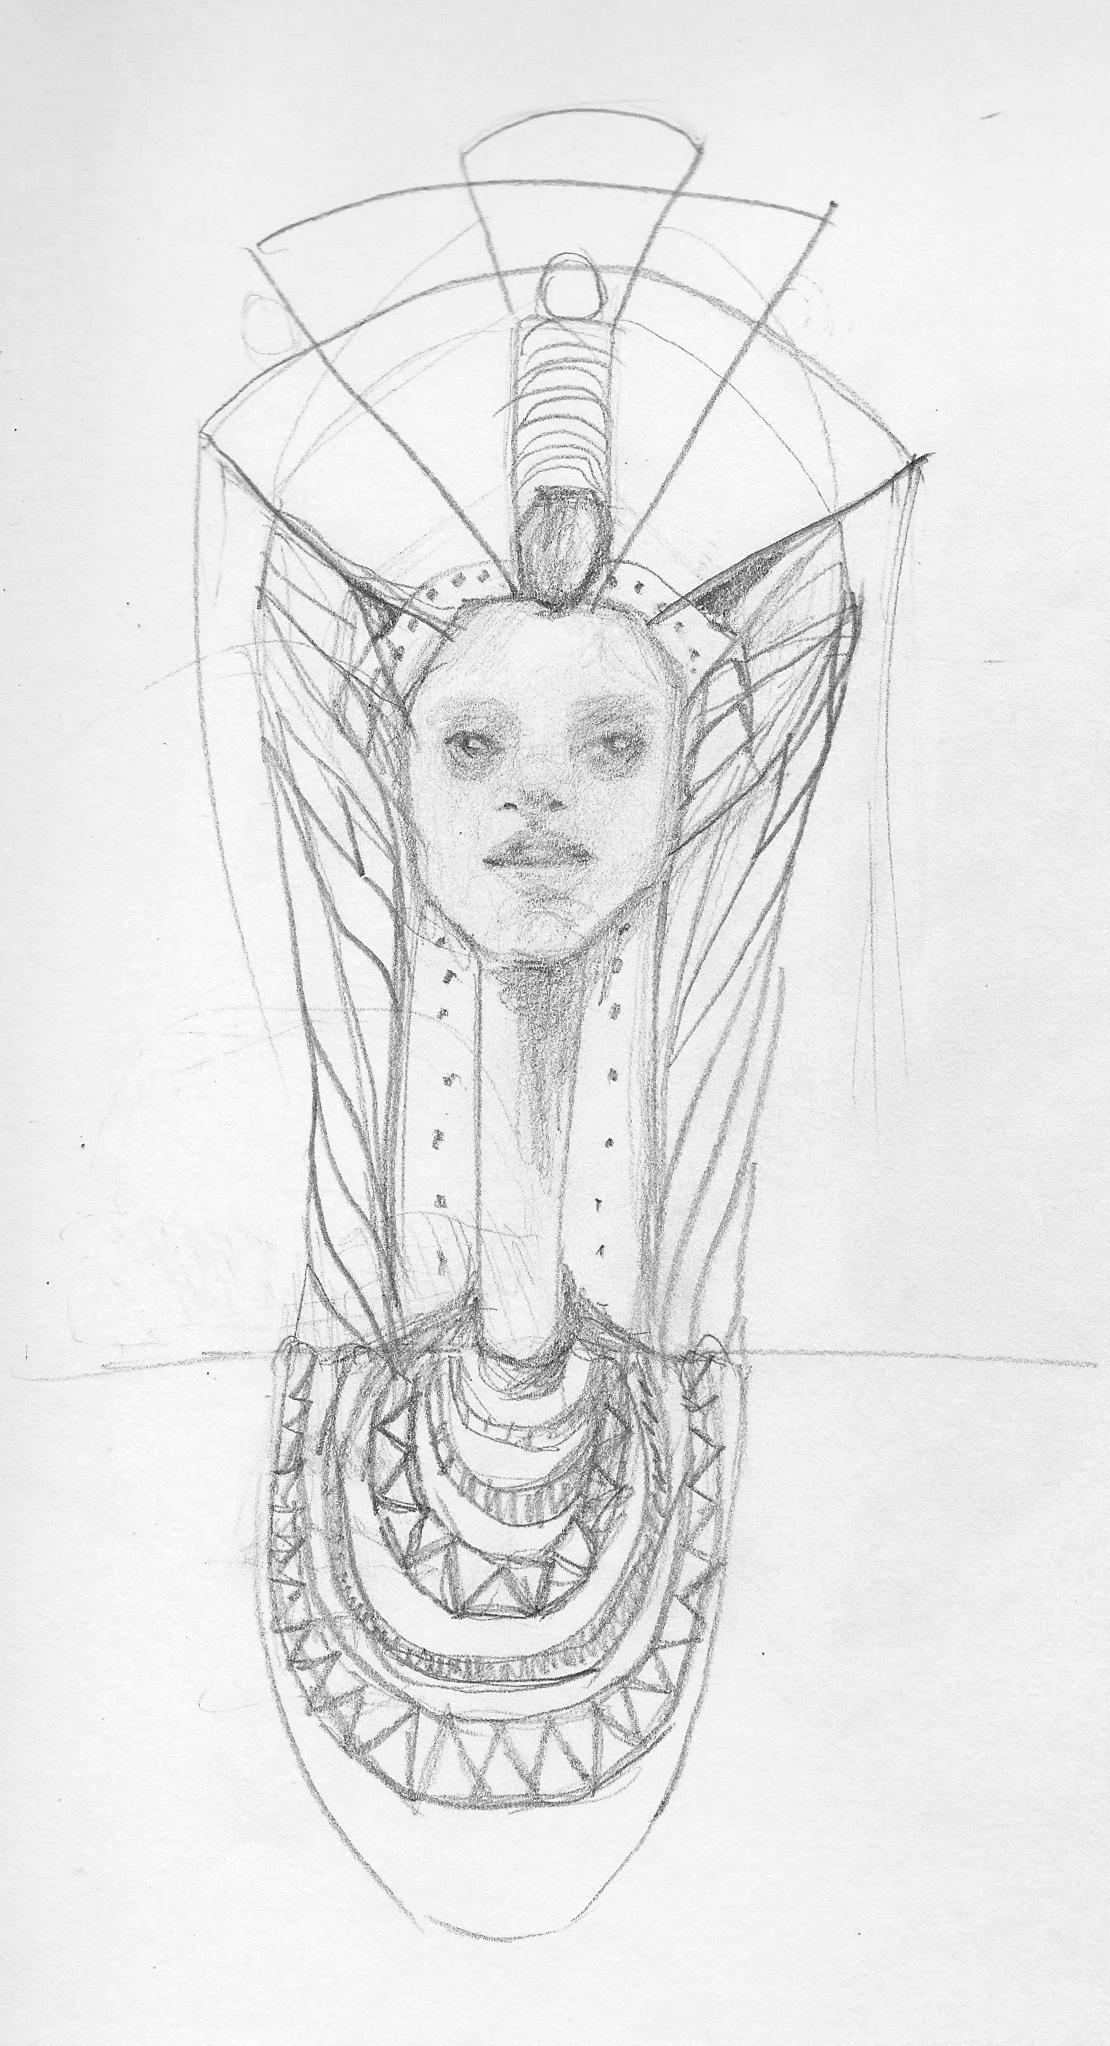 wynwood-fine-artist-ivette-cabrera.jpg